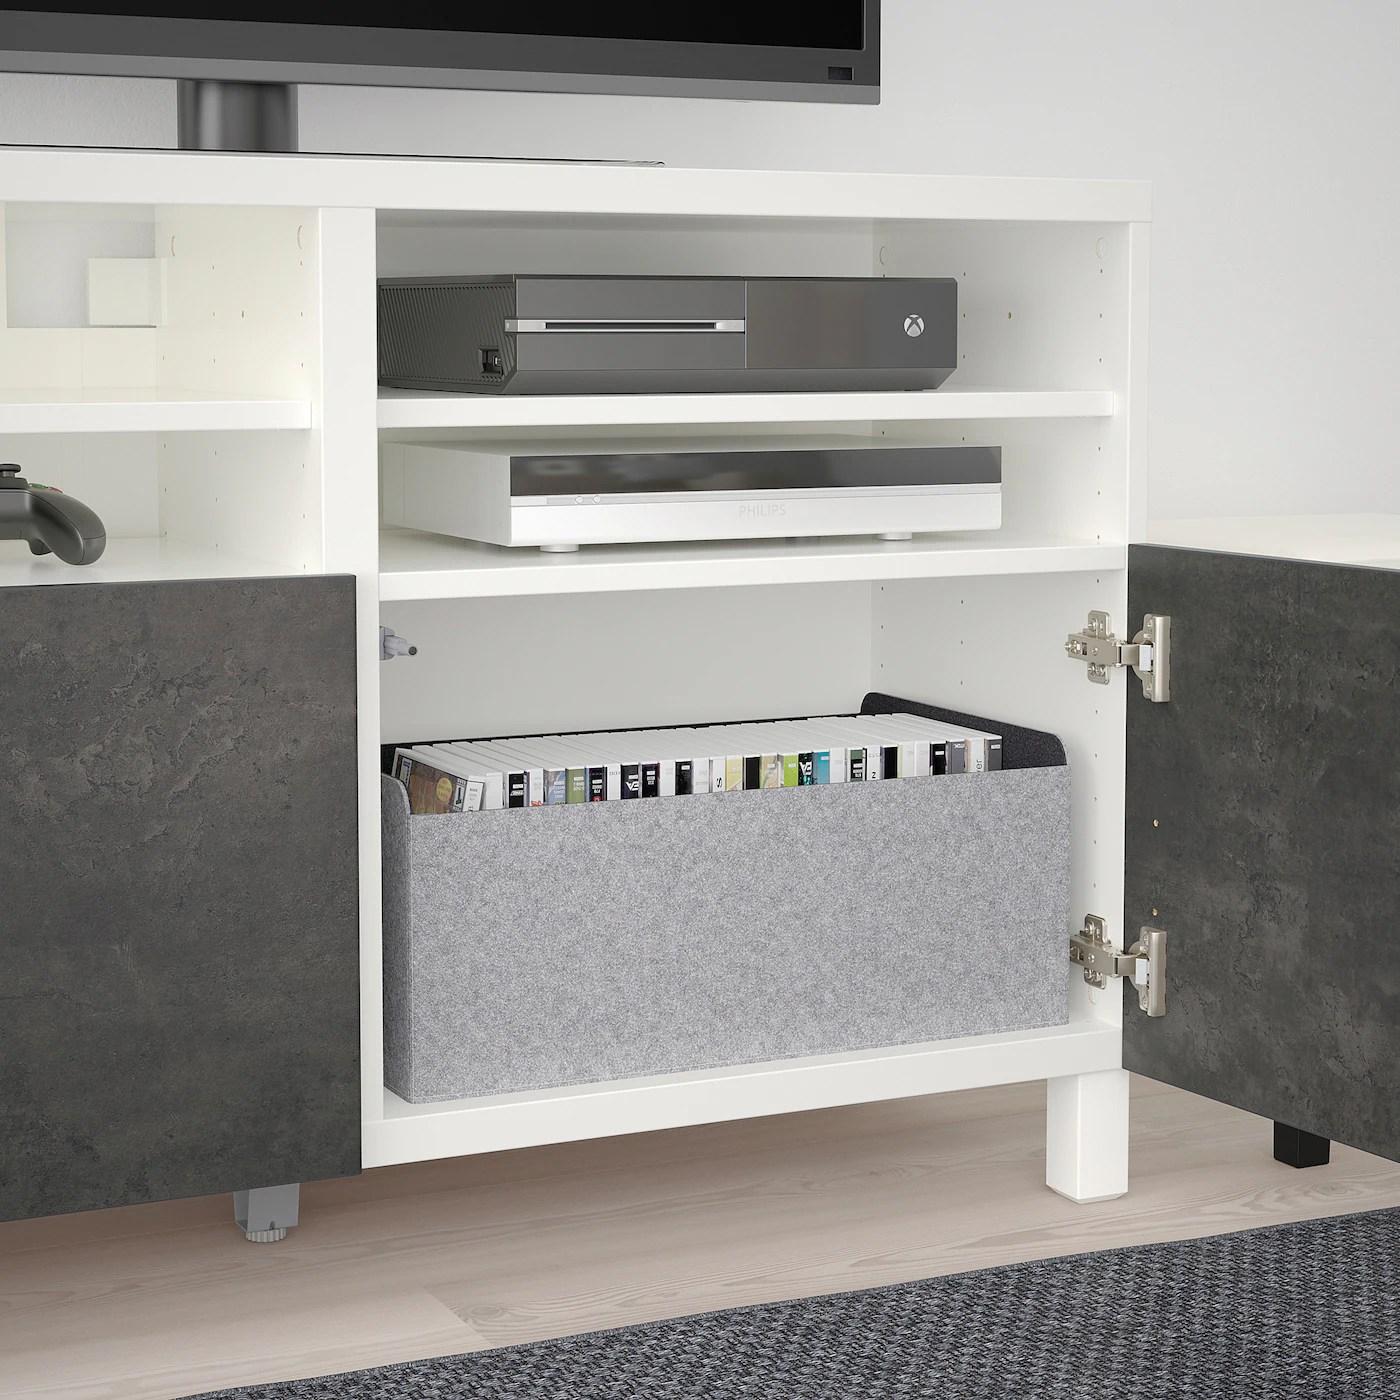 besta meuble tele avec portes blanc kallviken stubbarp gris fonce effet beton 47 1 4x16 1 2x29 1 8 120x42x74 cm